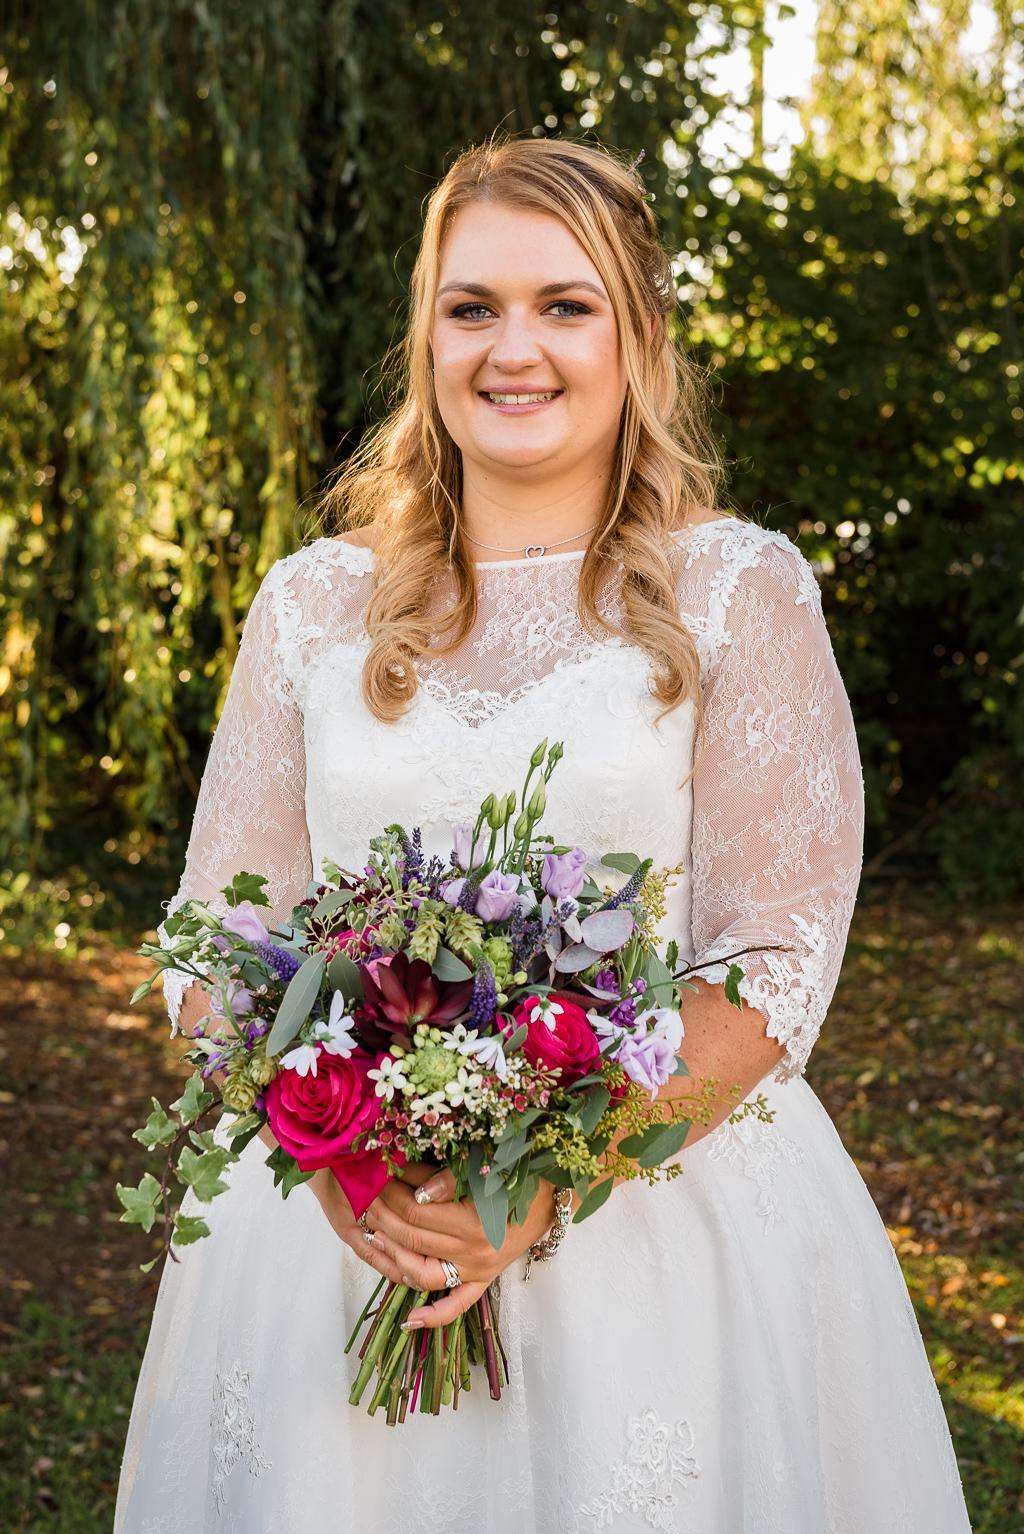 Bride and groom portraits at The Creek Faversham Kent | Oakhouse Photography